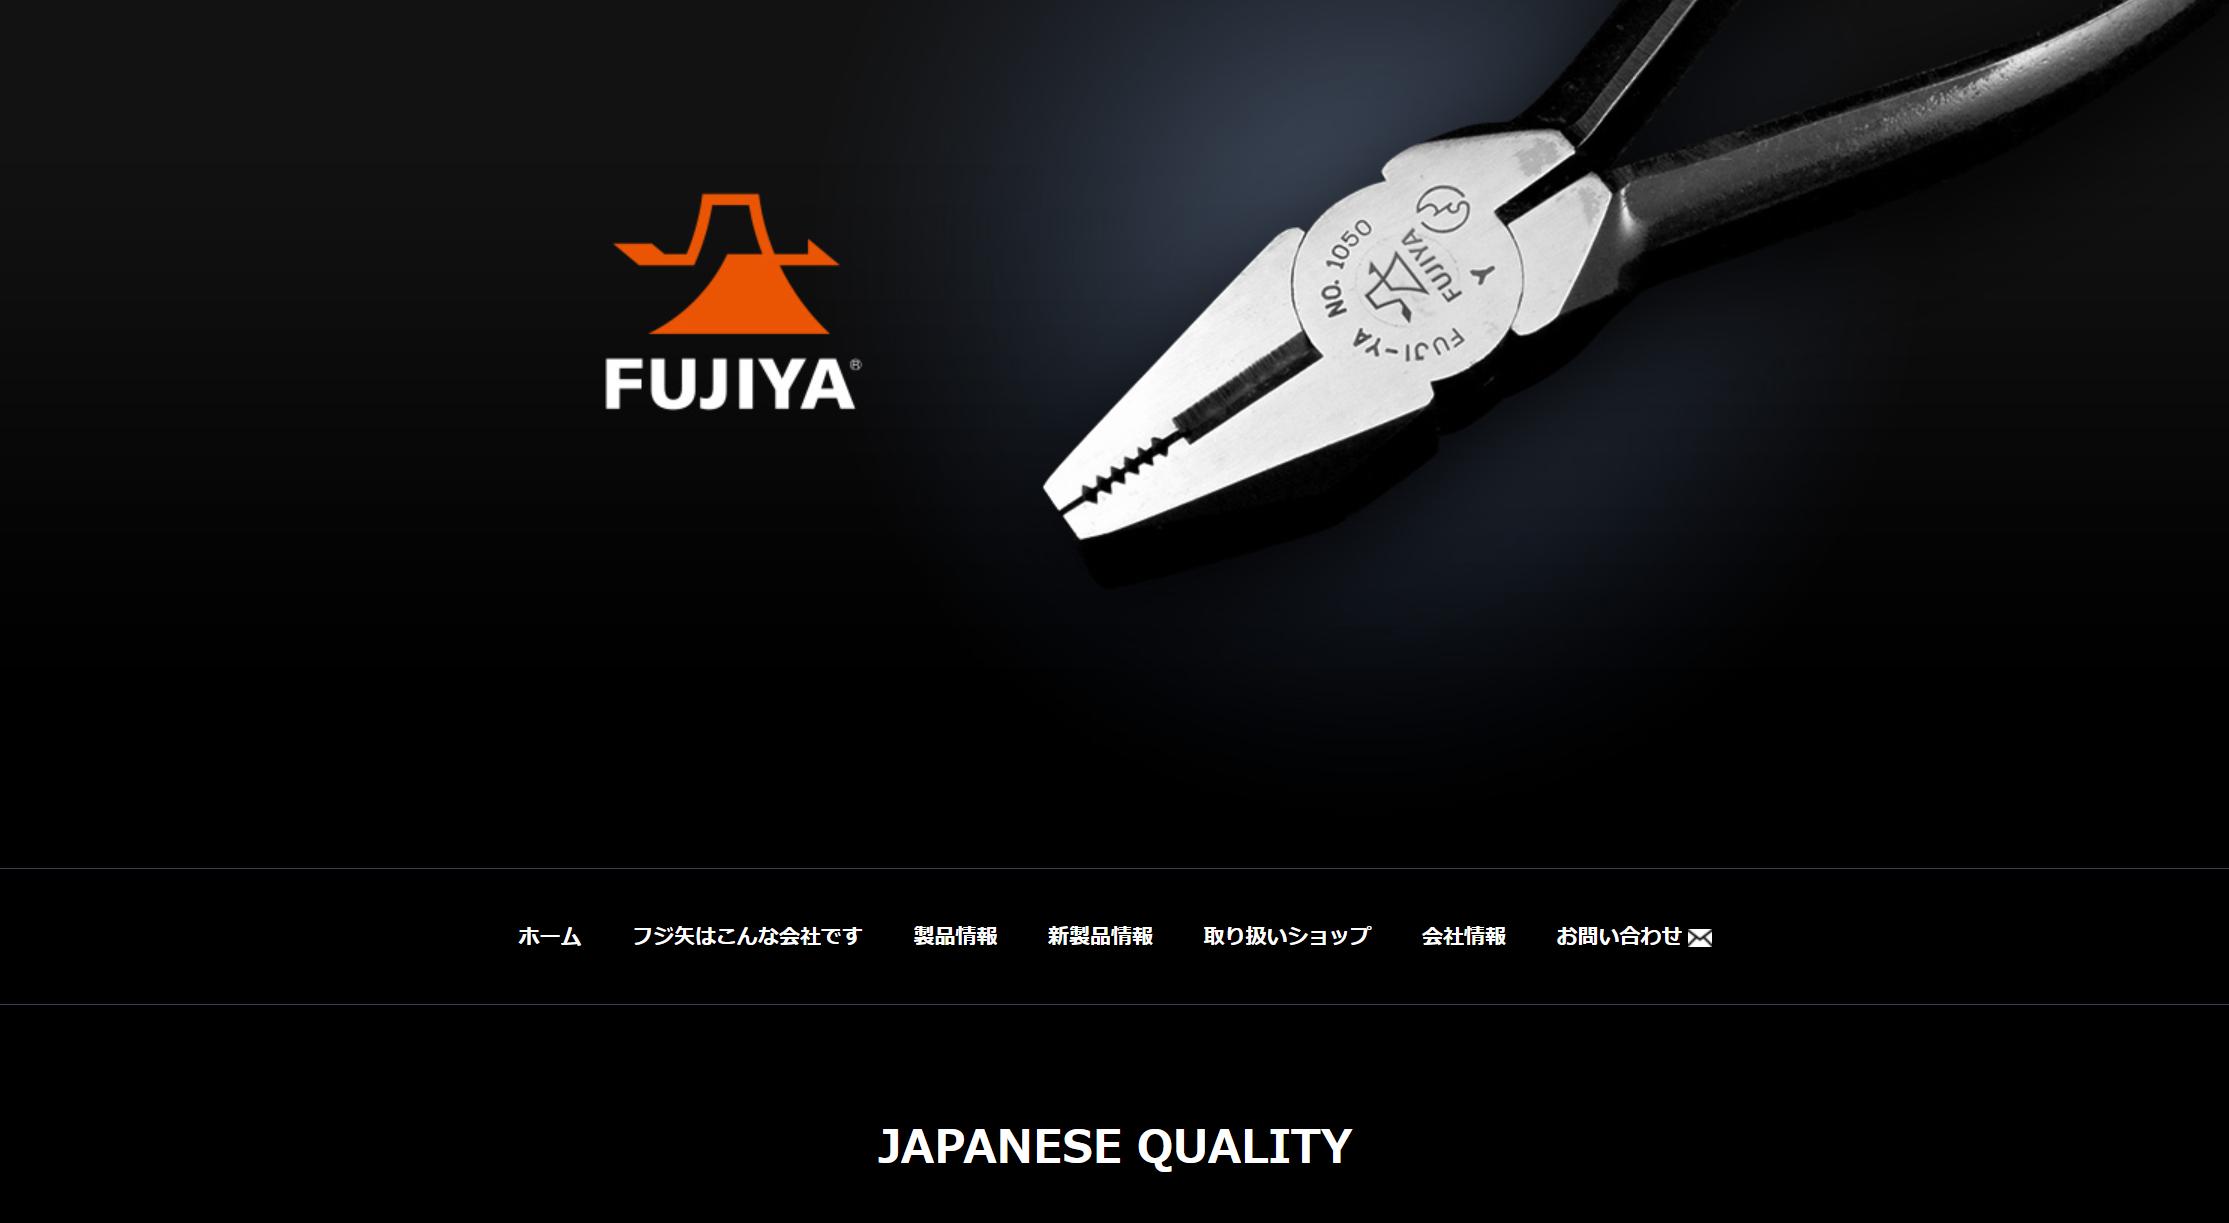 fujiya.png